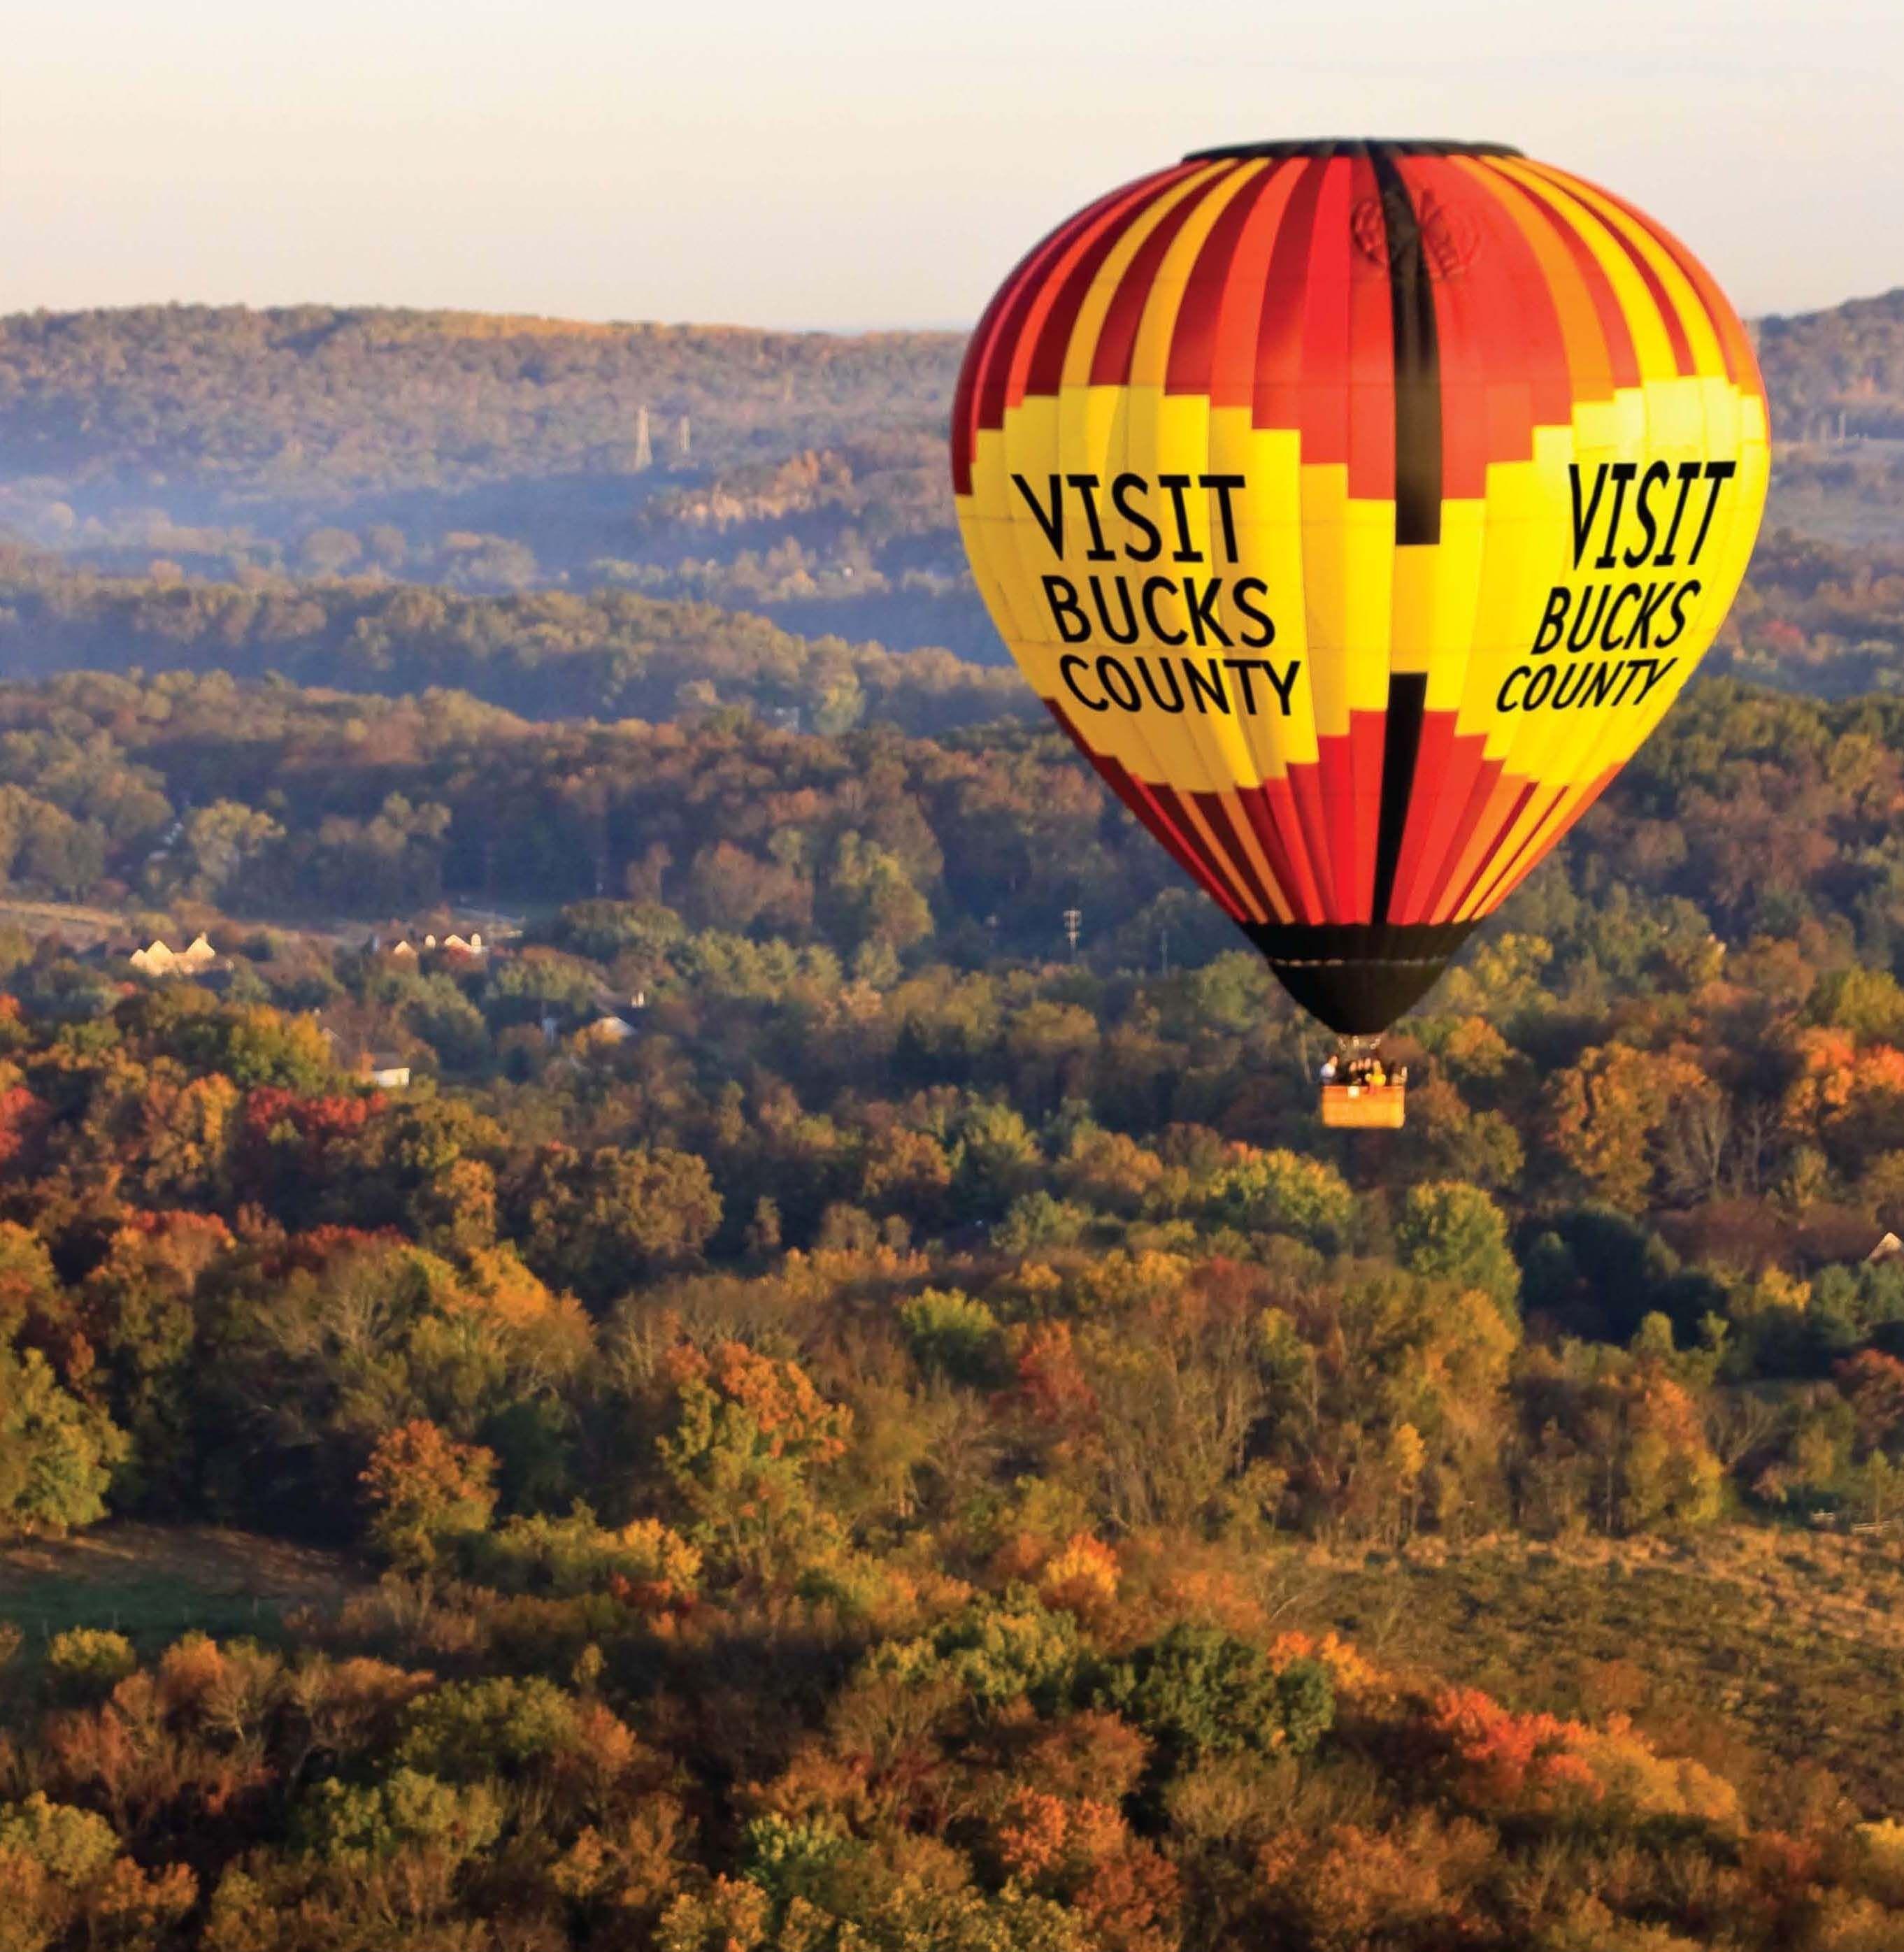 Hot Air Balloon Rides in Bucks County, PA, Lehigh Valley